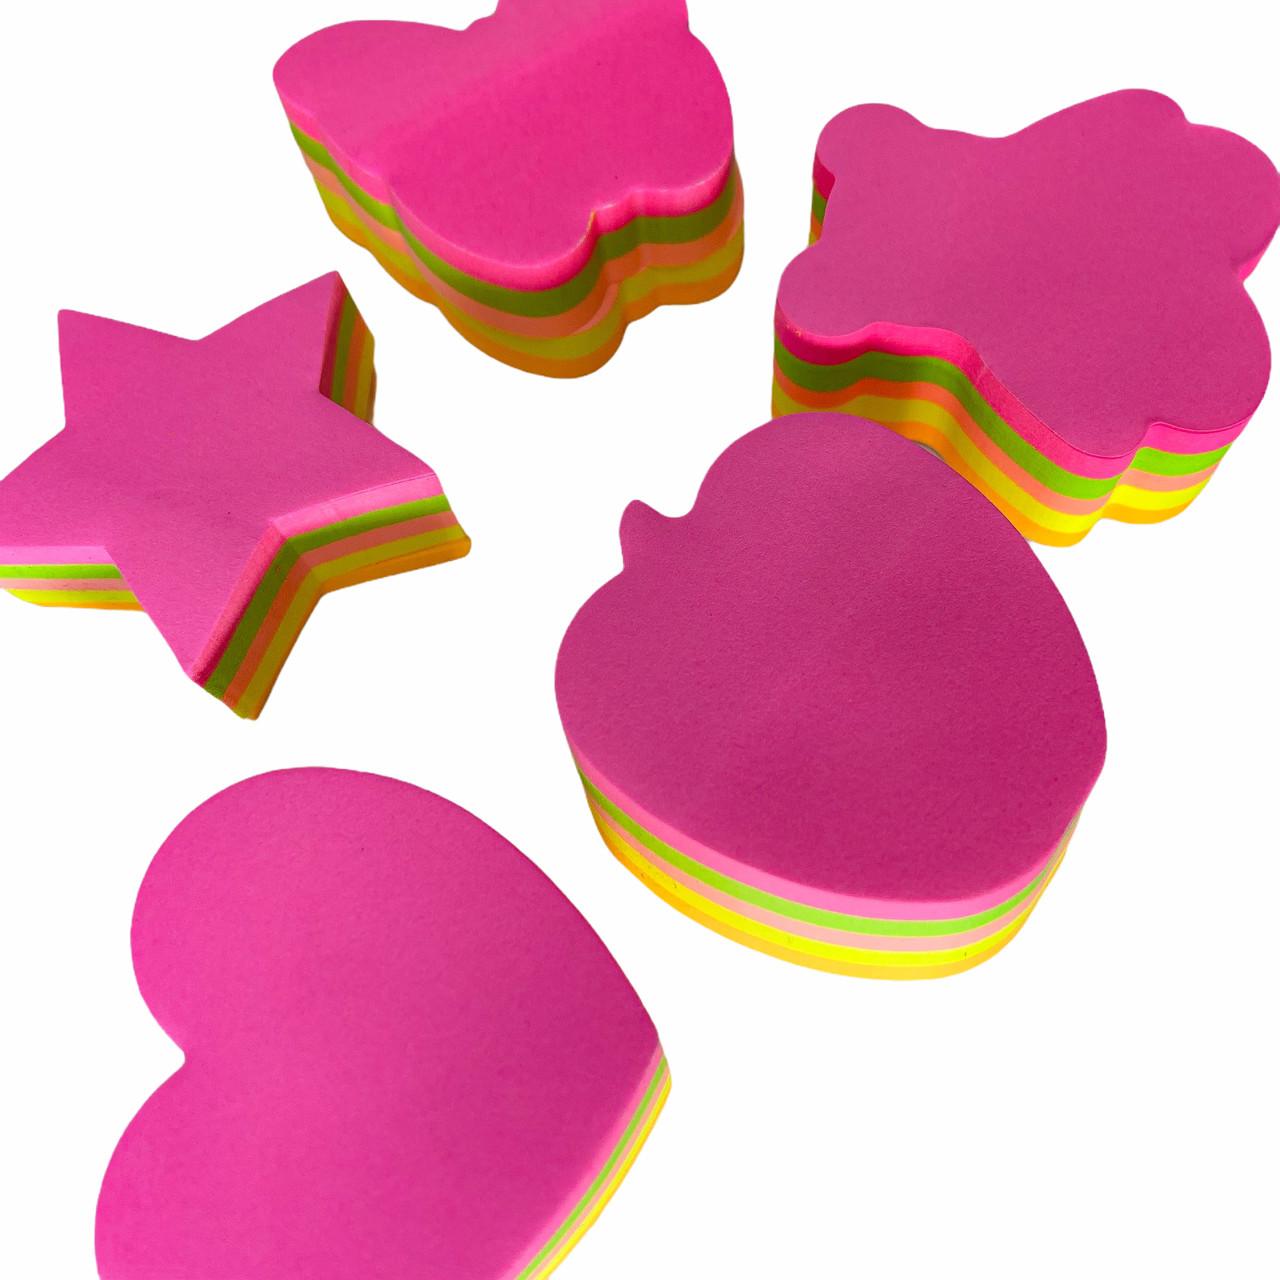 Anote e Cole Formas Diversas Colorida Neon 200 Folhas Moure Jar